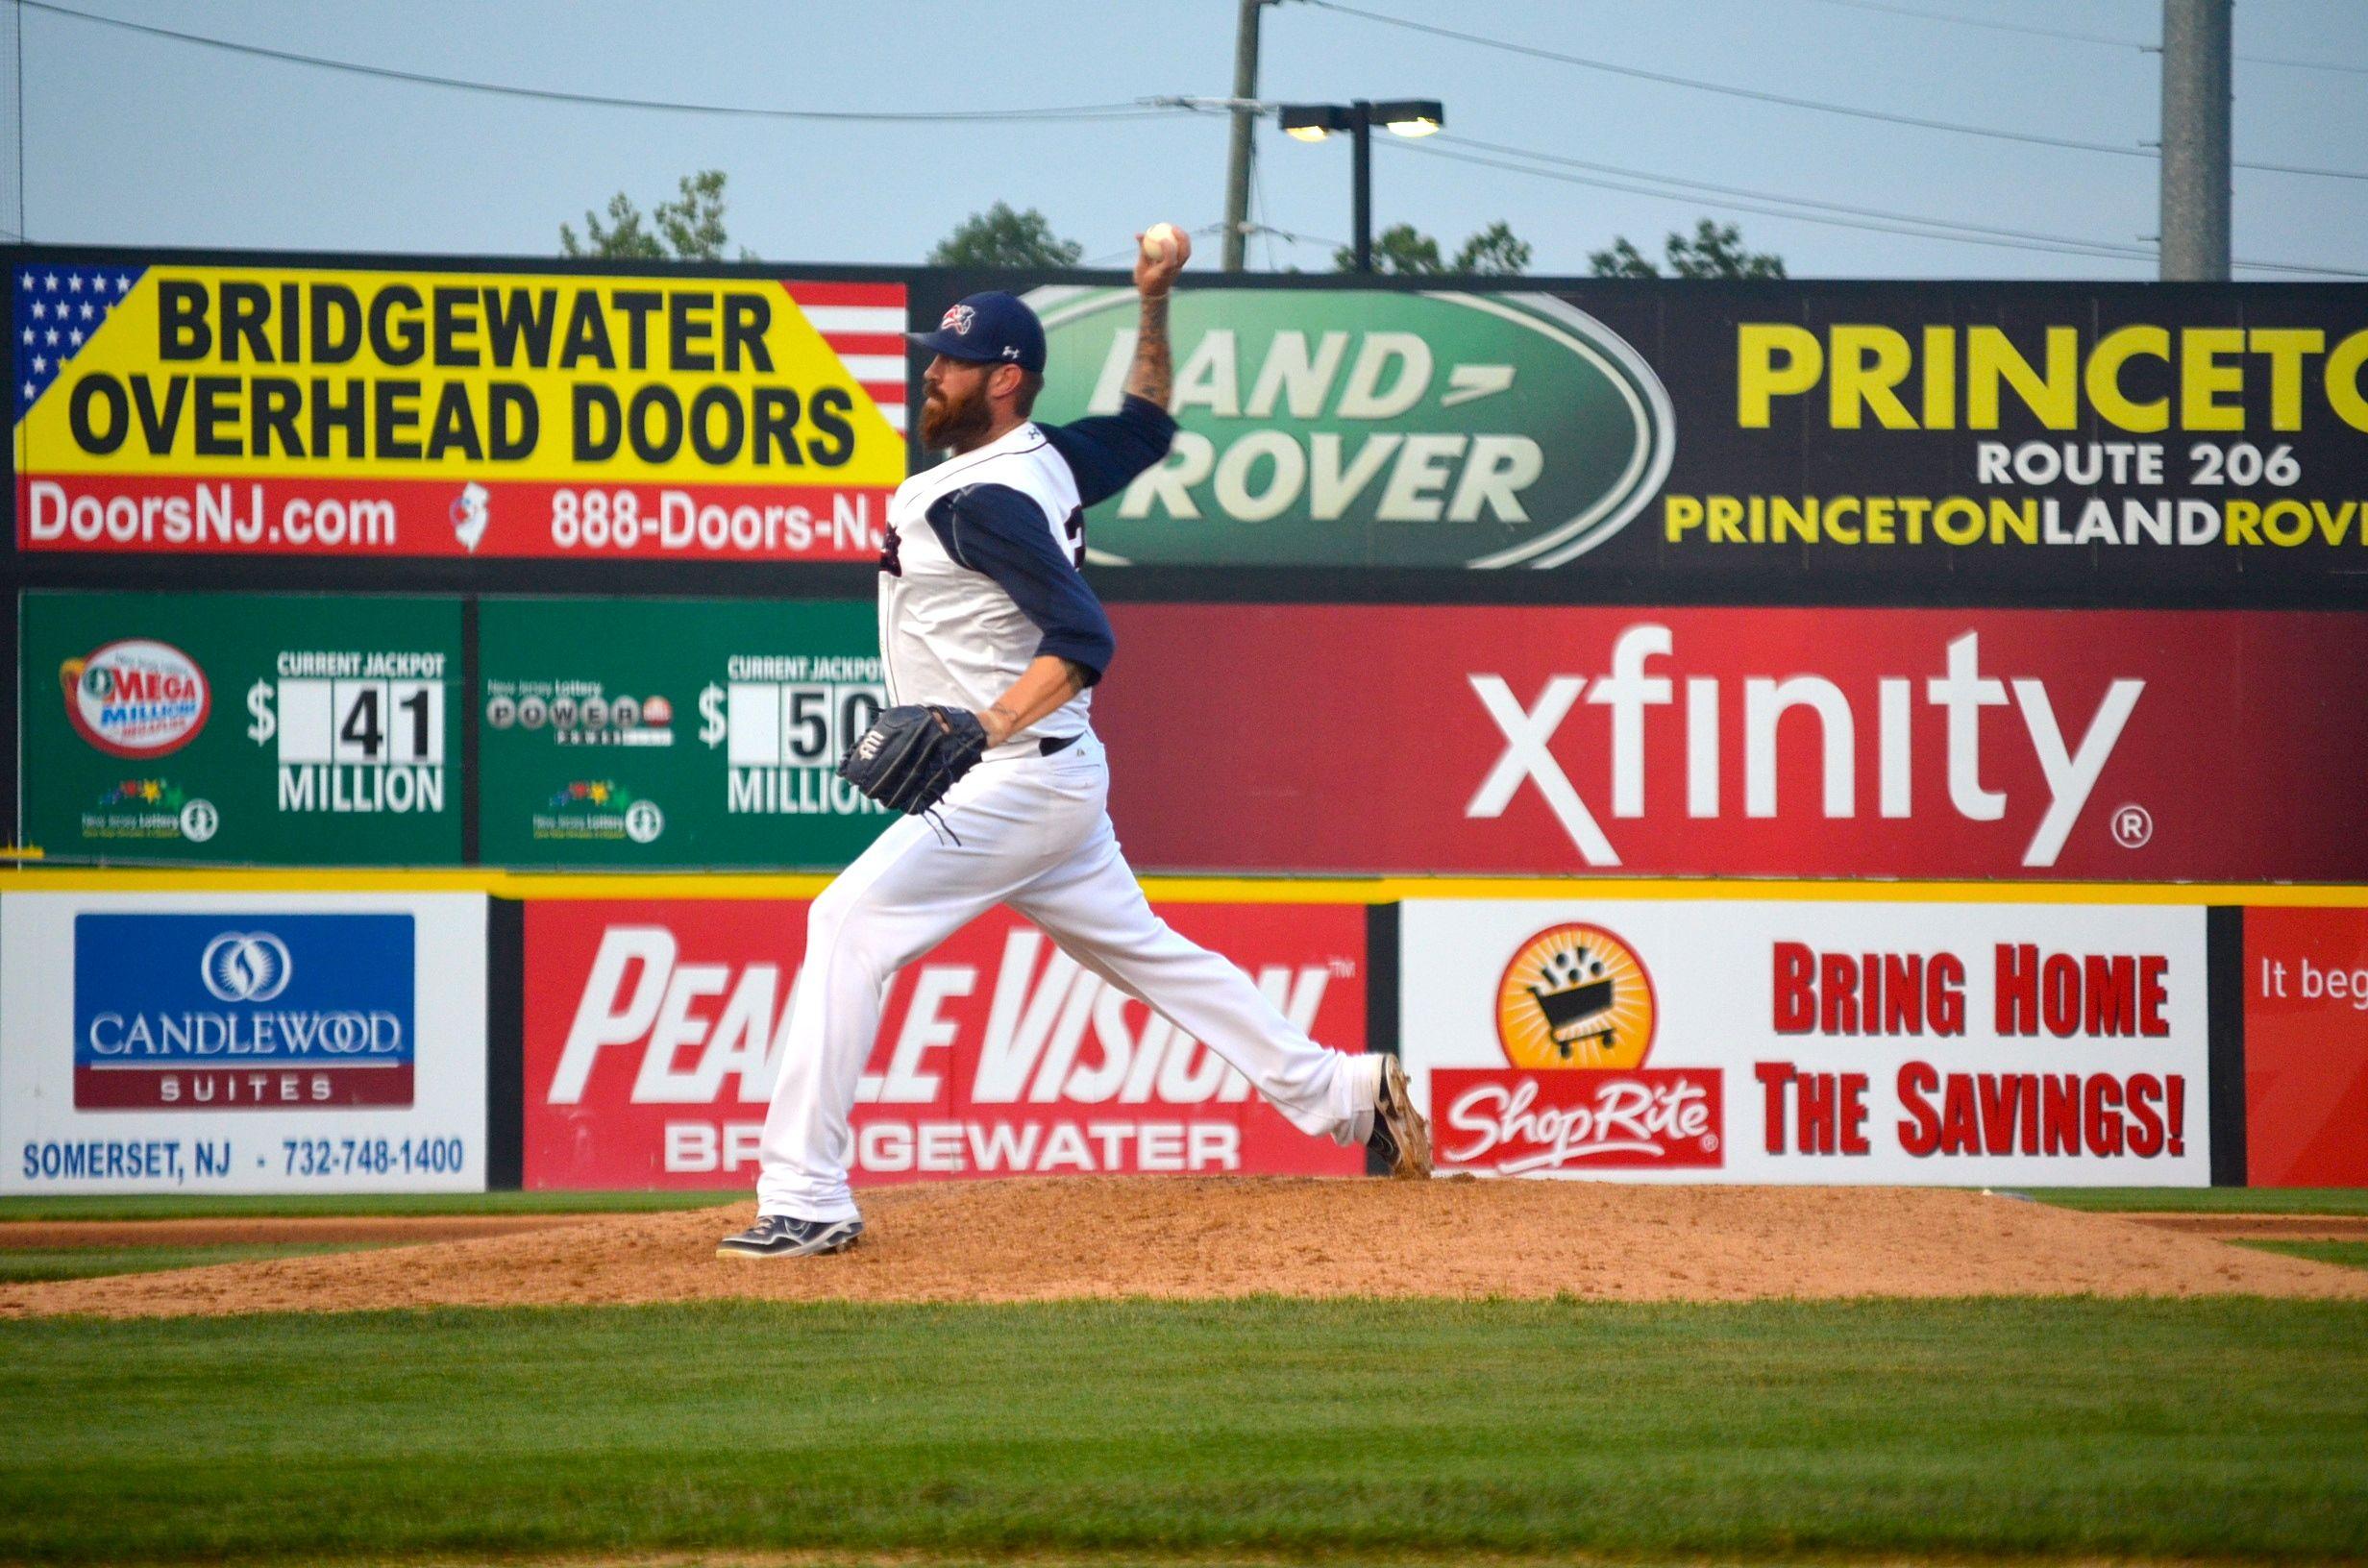 Jon Hunton Baseball Pitcher Somersetpatriots Getpatriotic Affordable Family Fun Family Fun New Jersey